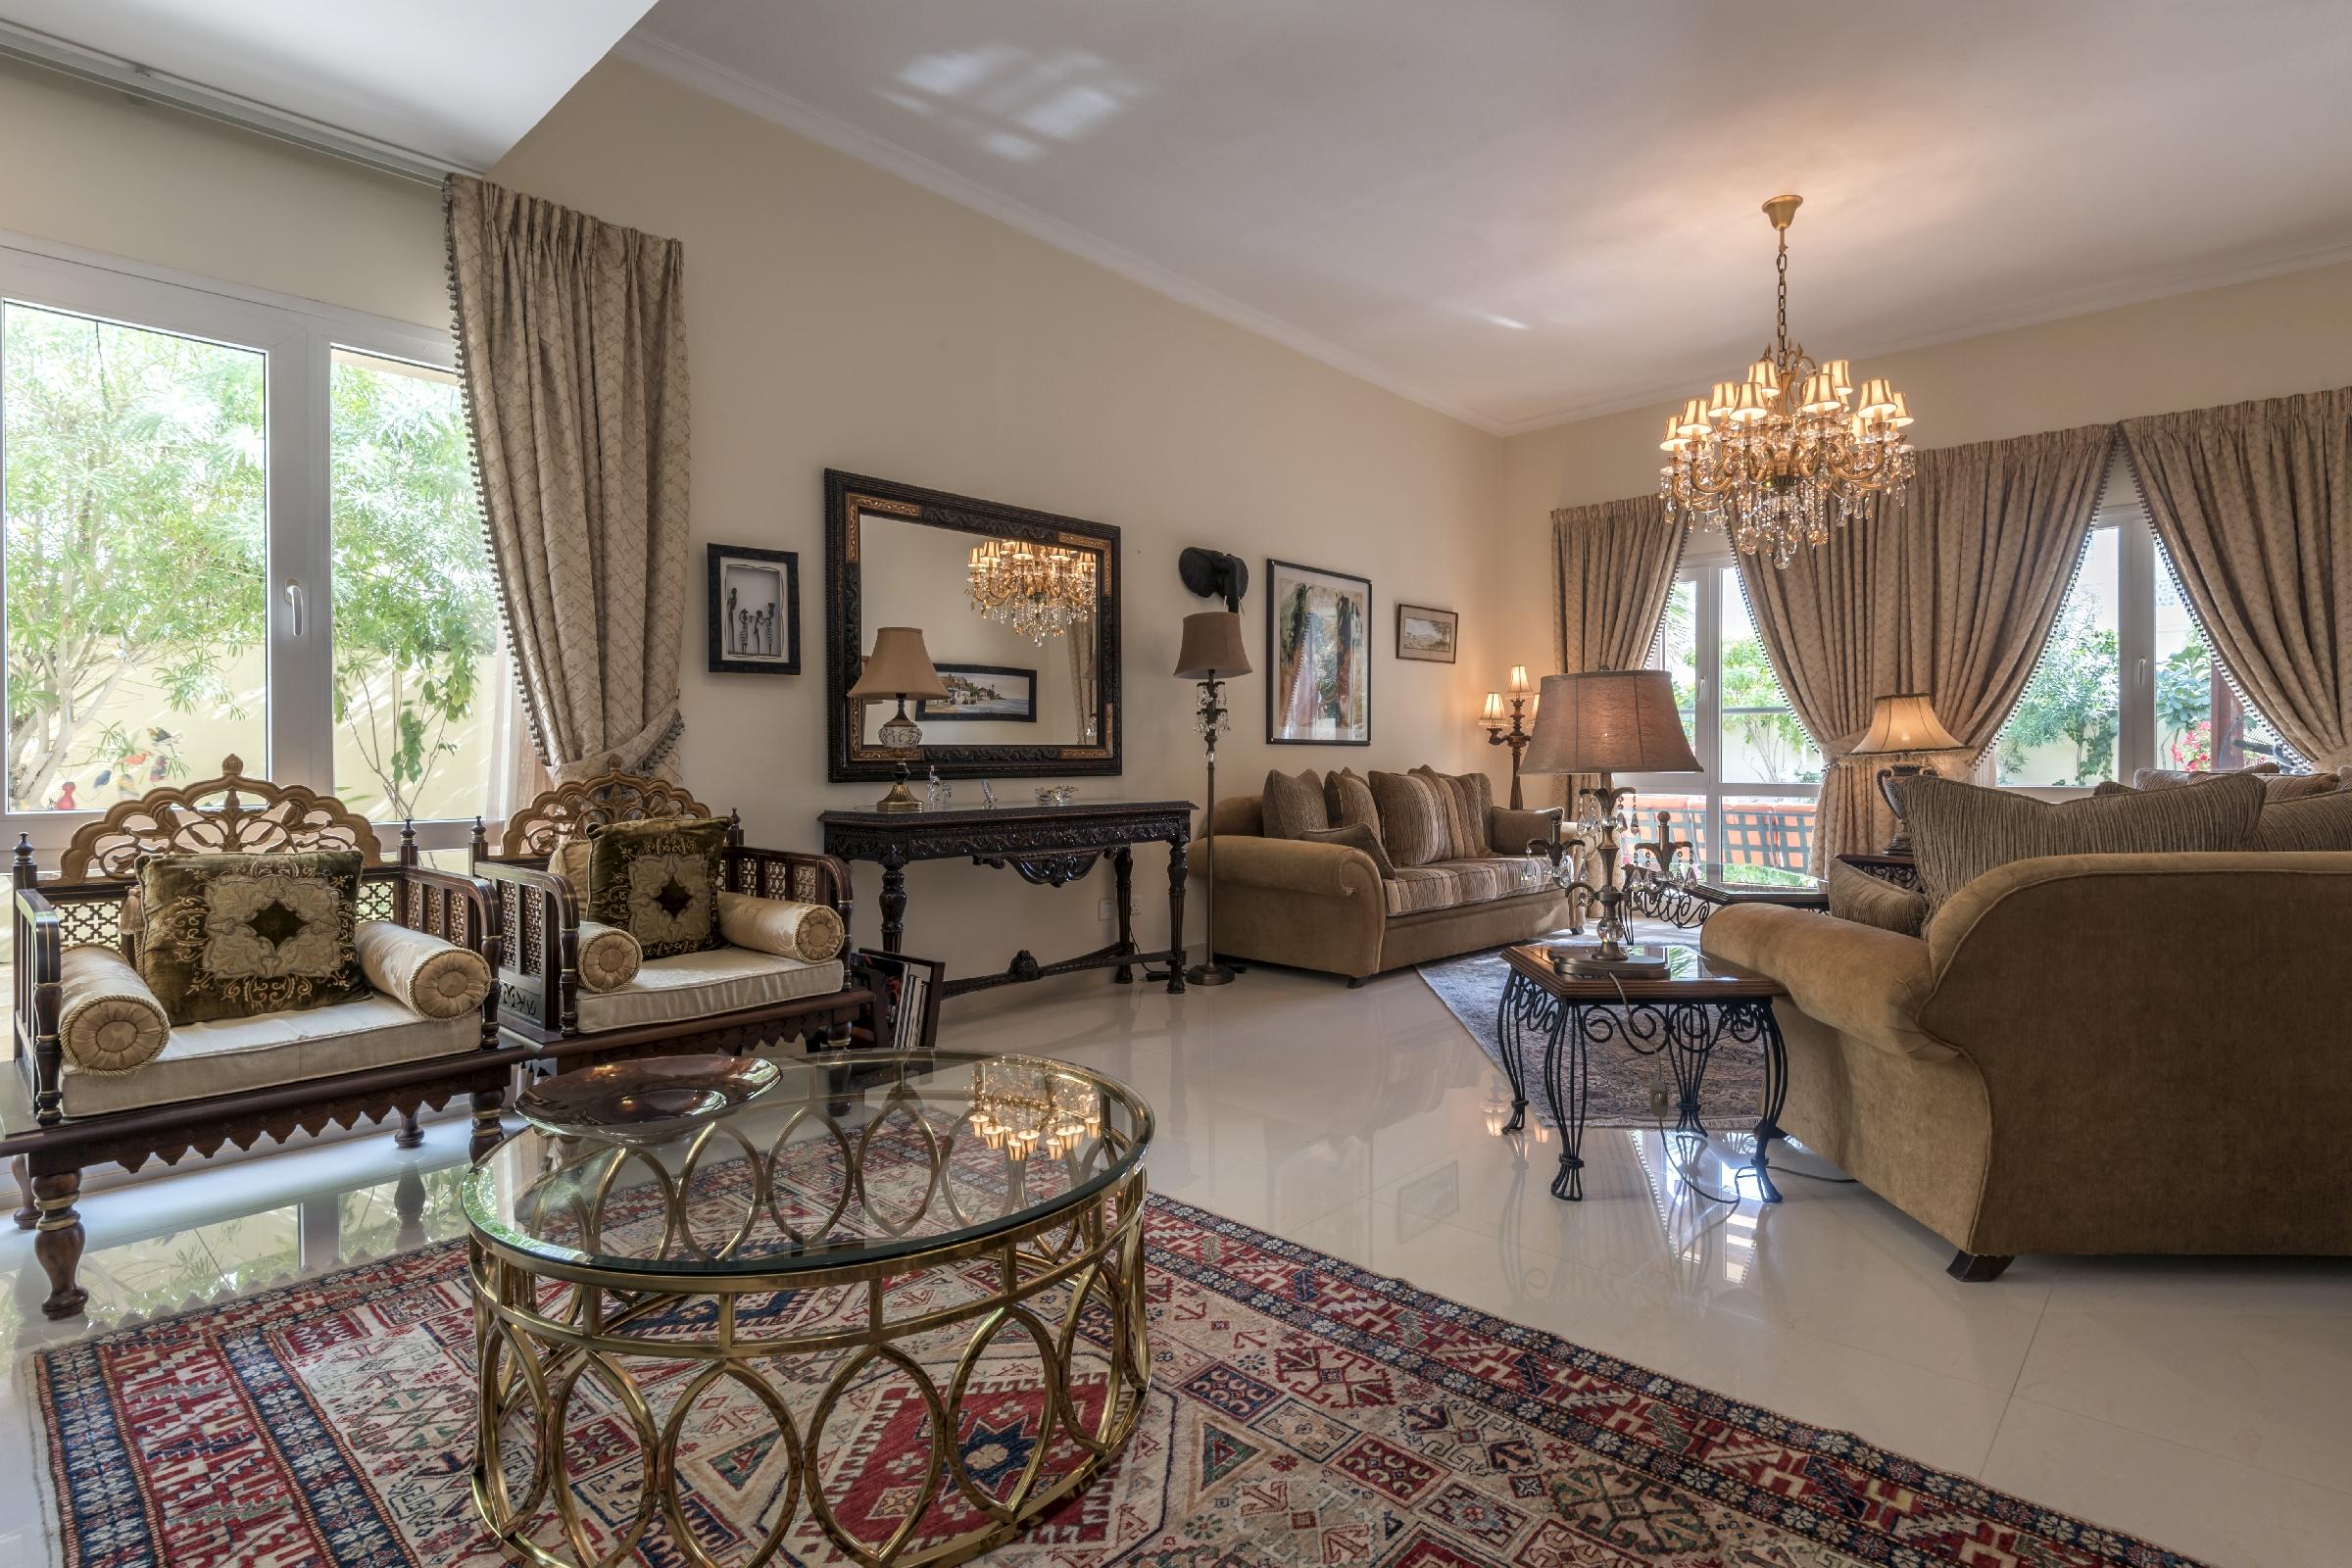 Single Family Home for Sale at The Meadows Villa Dubai, United Arab Emirates